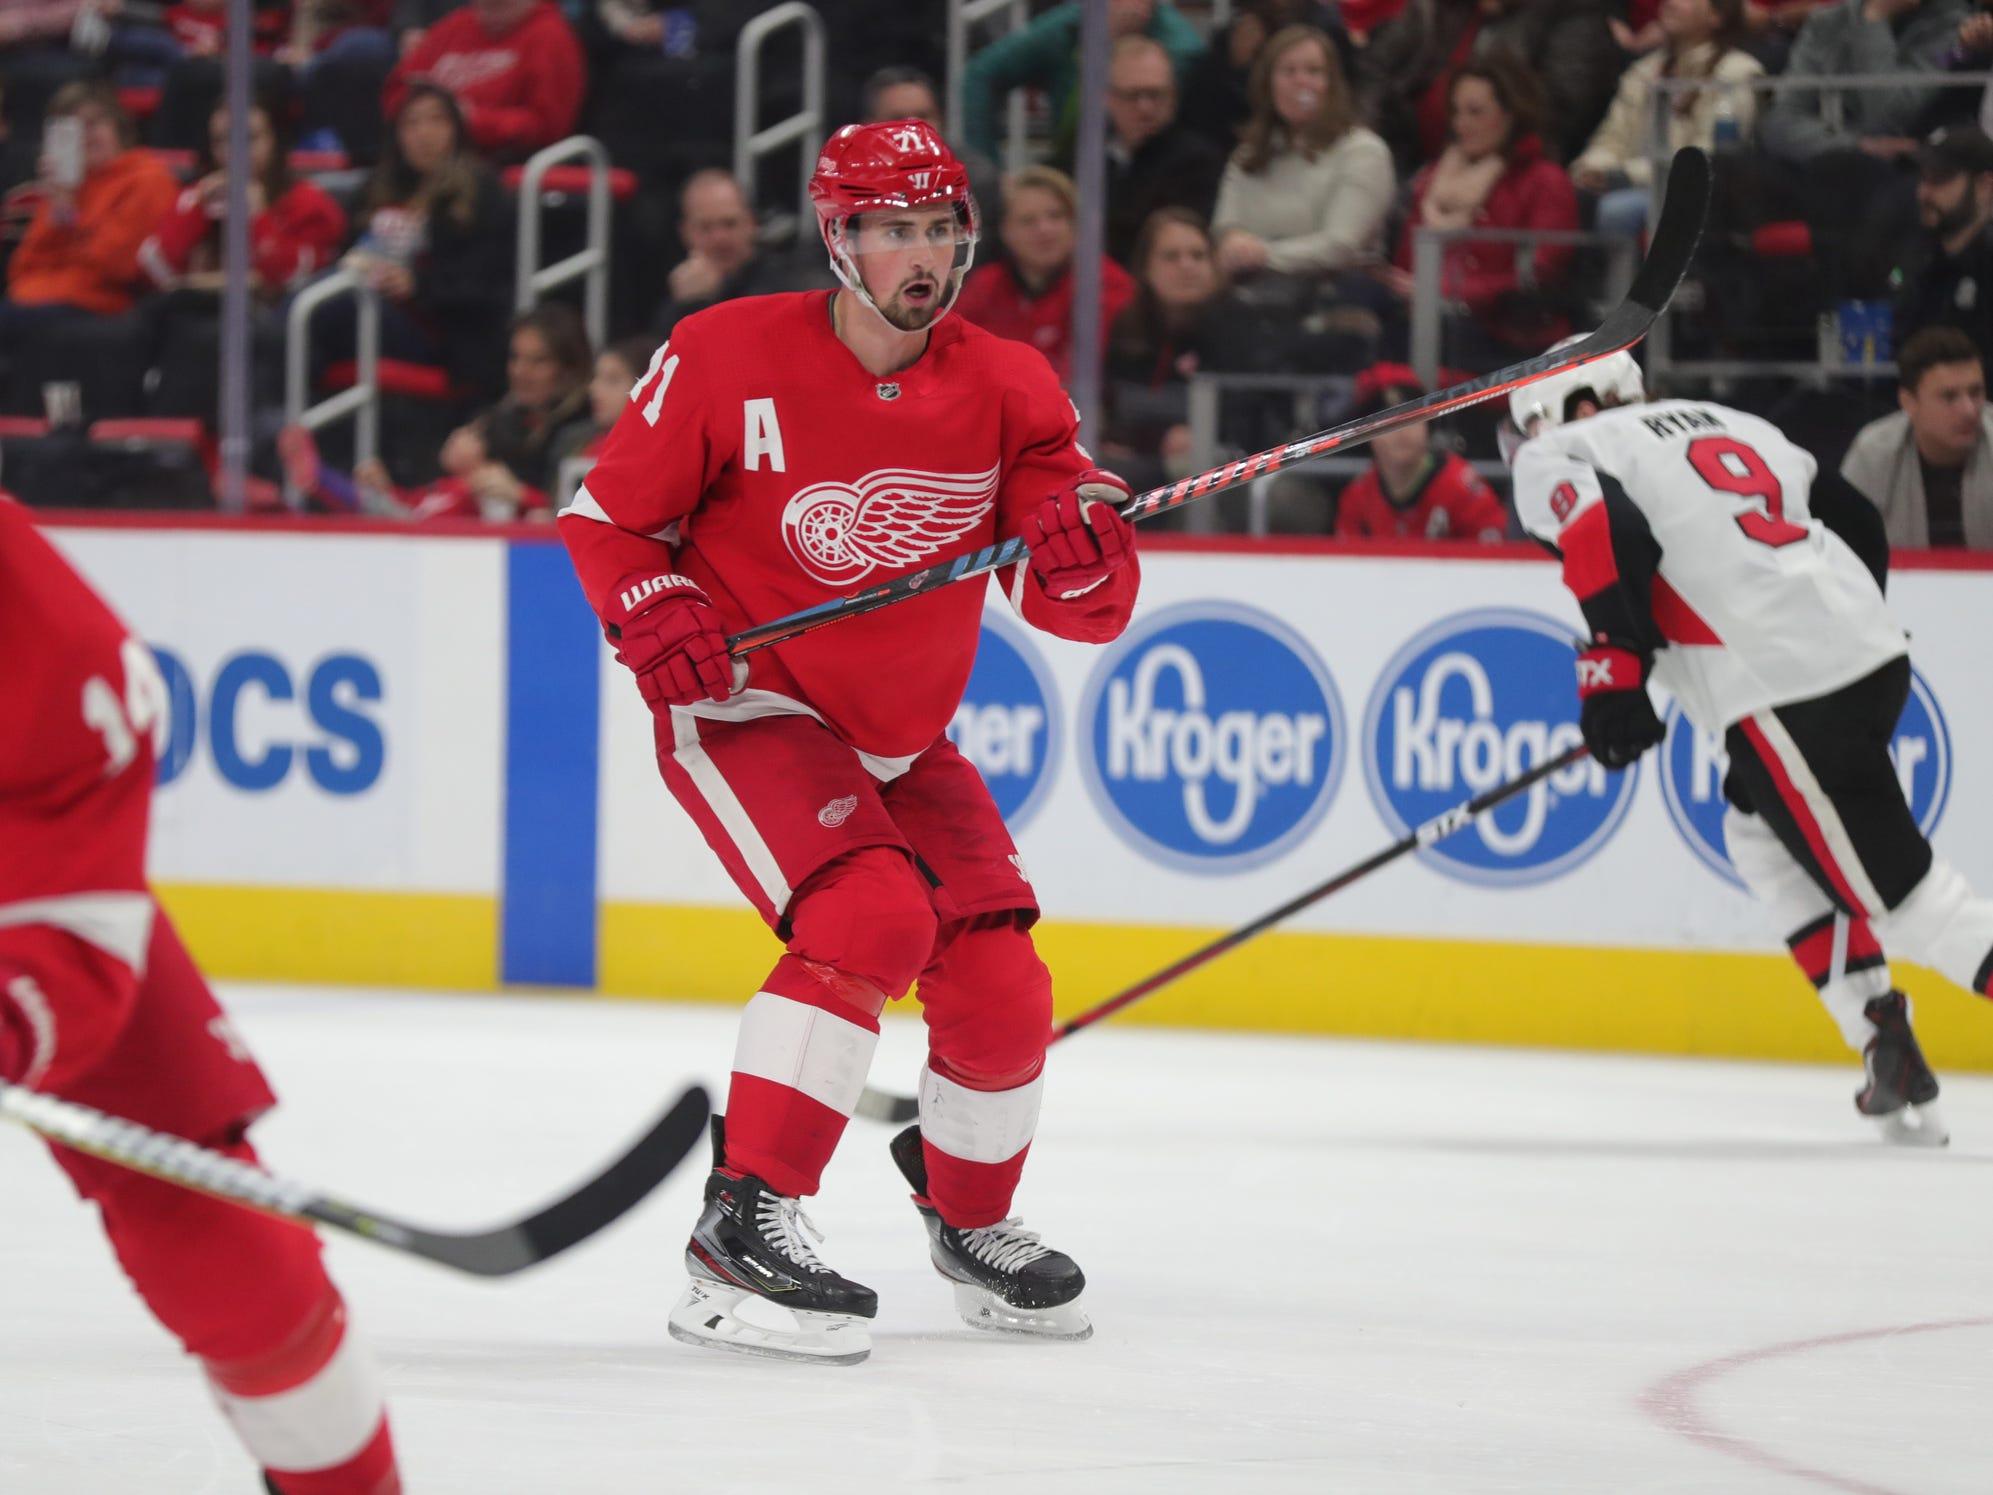 Detroit Red Wings center Dylan Larkin skates against the Ottawa Senators in the third period on Feb. 14, 2019, in Detroit.